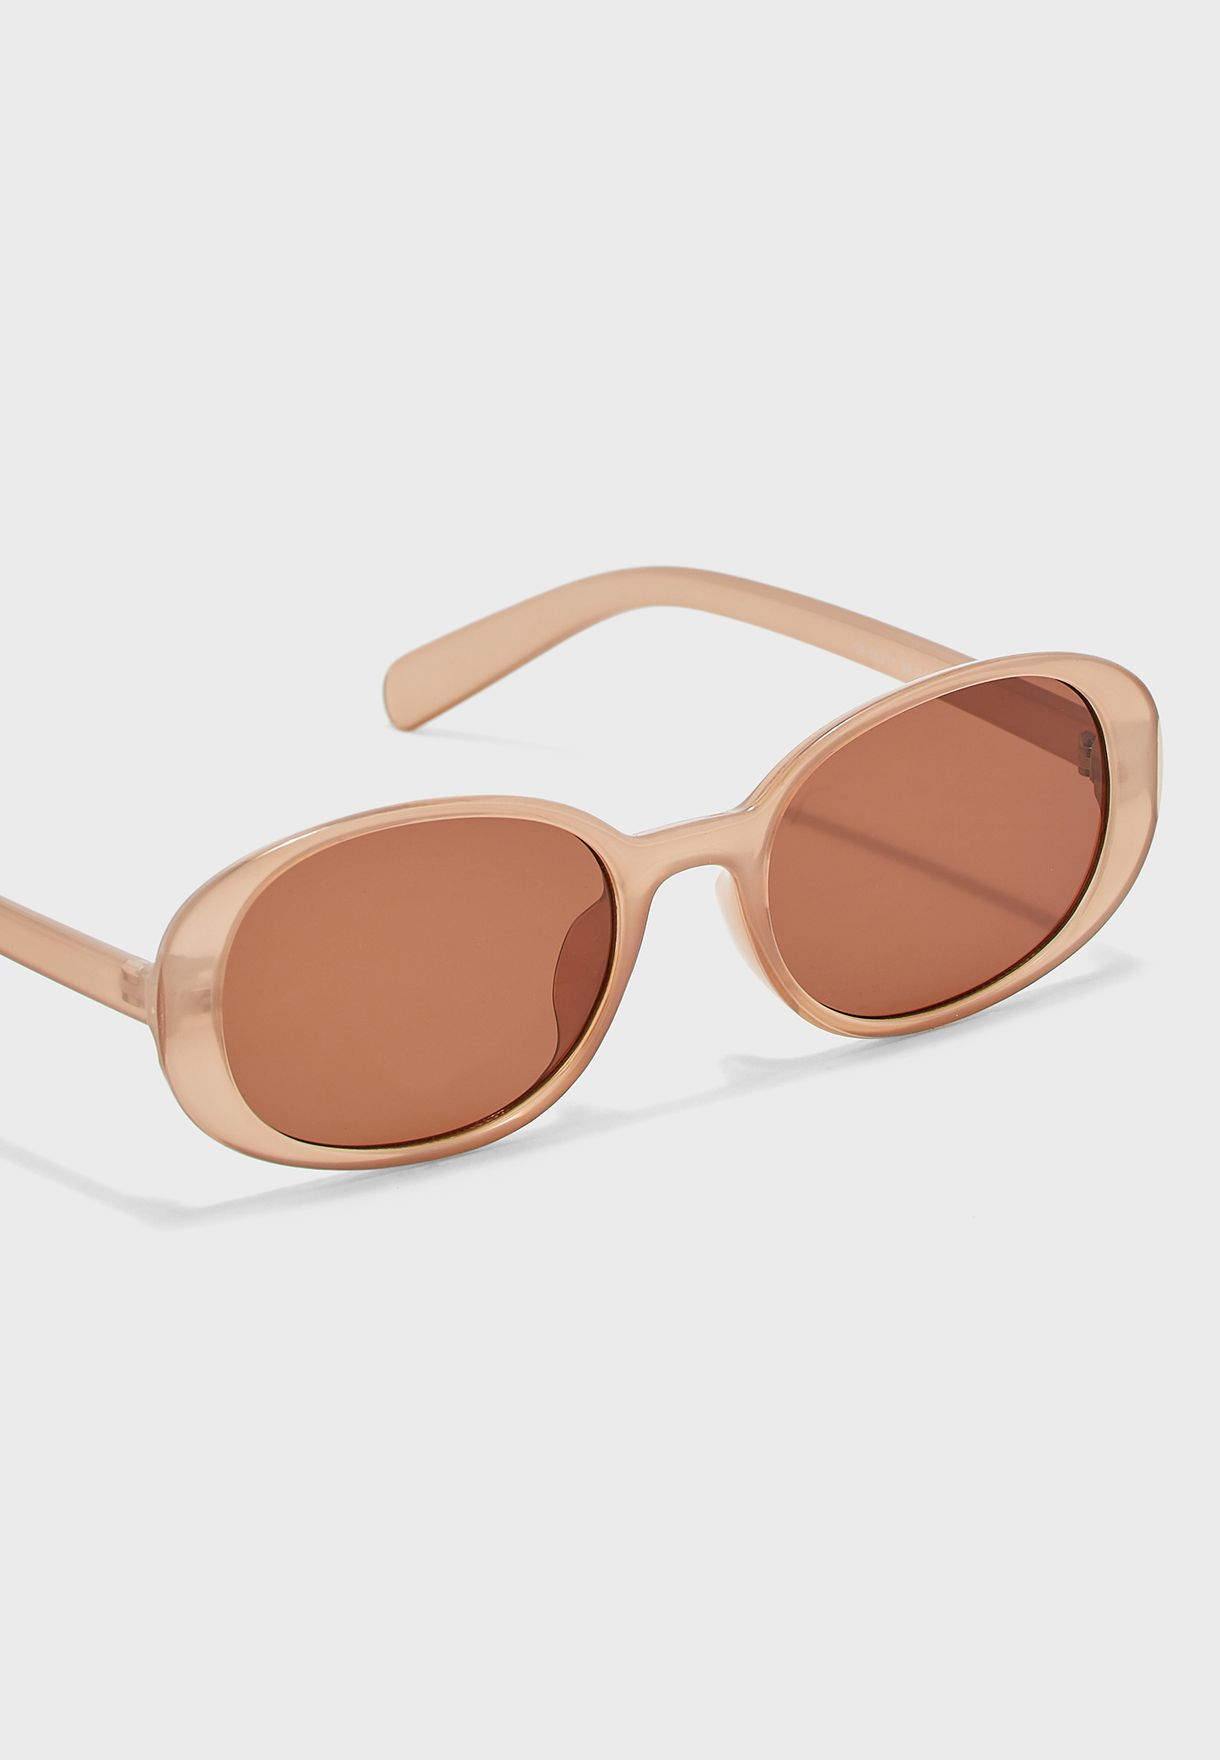 Retro Oversize Sunglasses